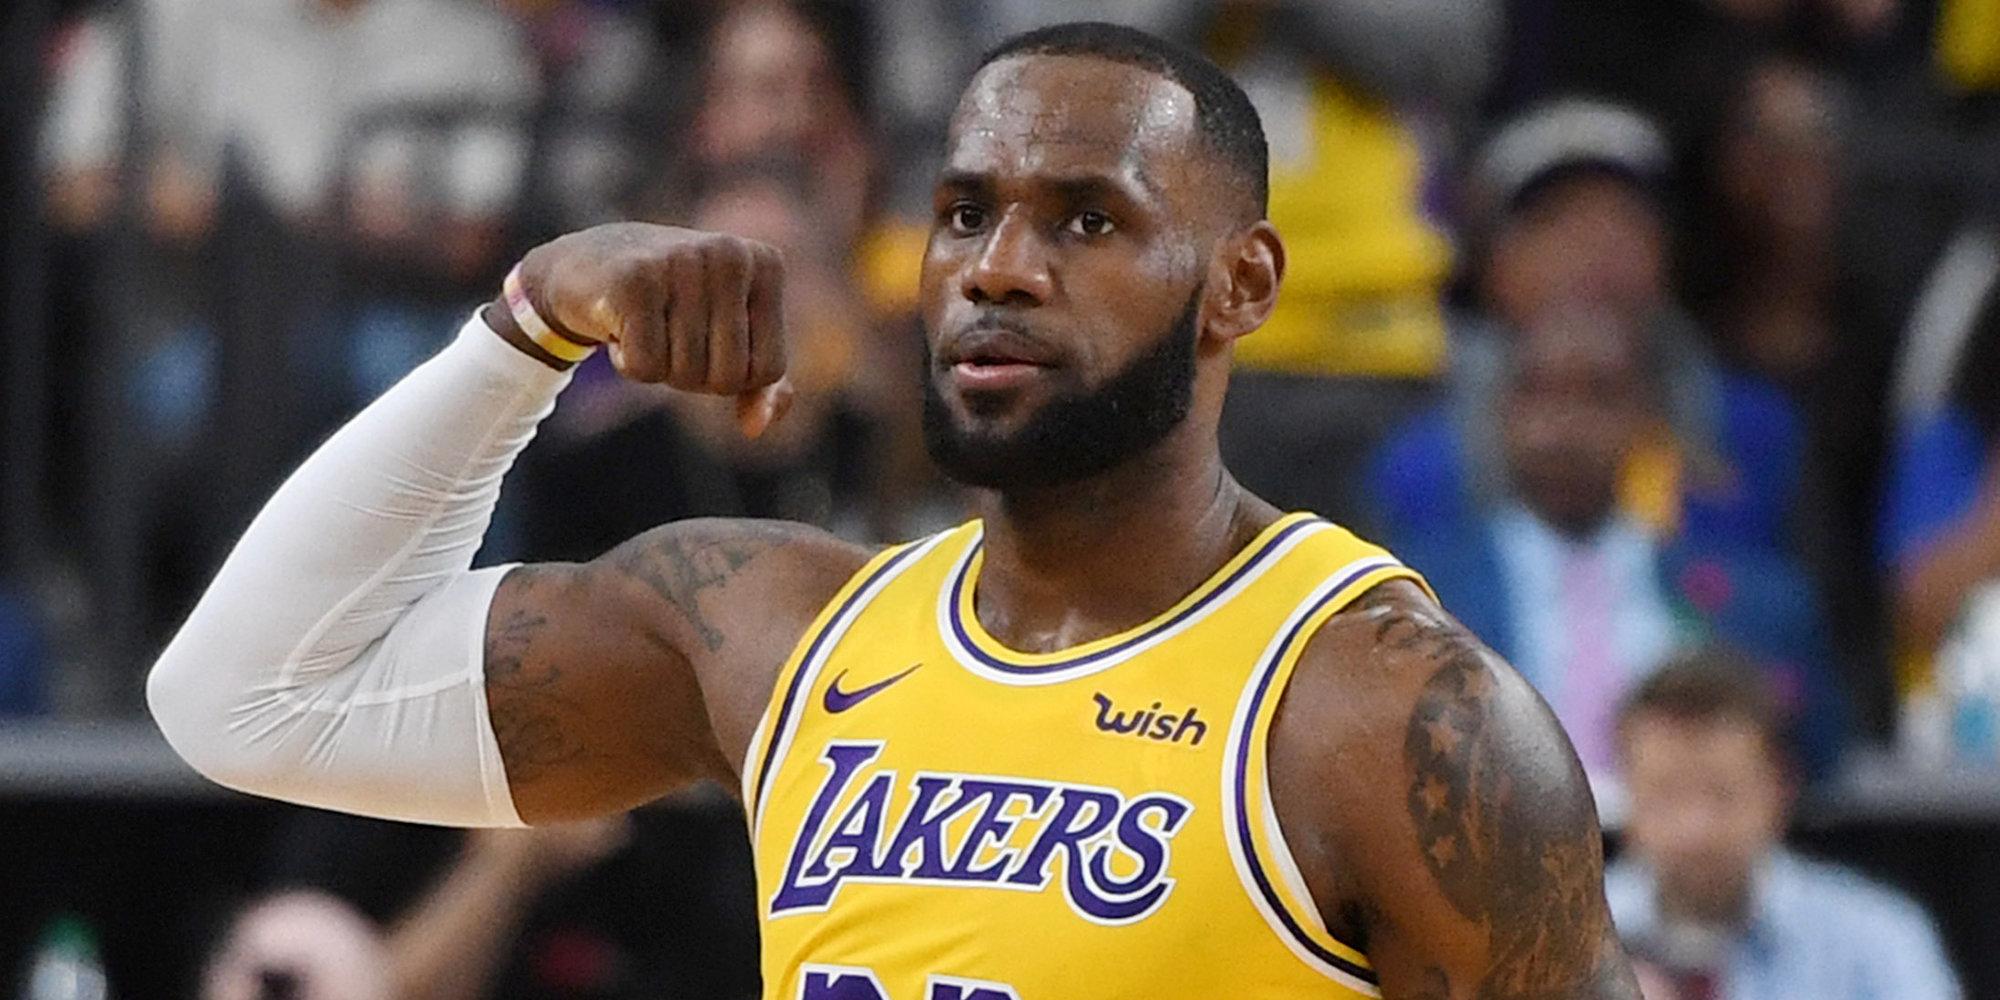 Леброн Джеймс переписал историю НБА